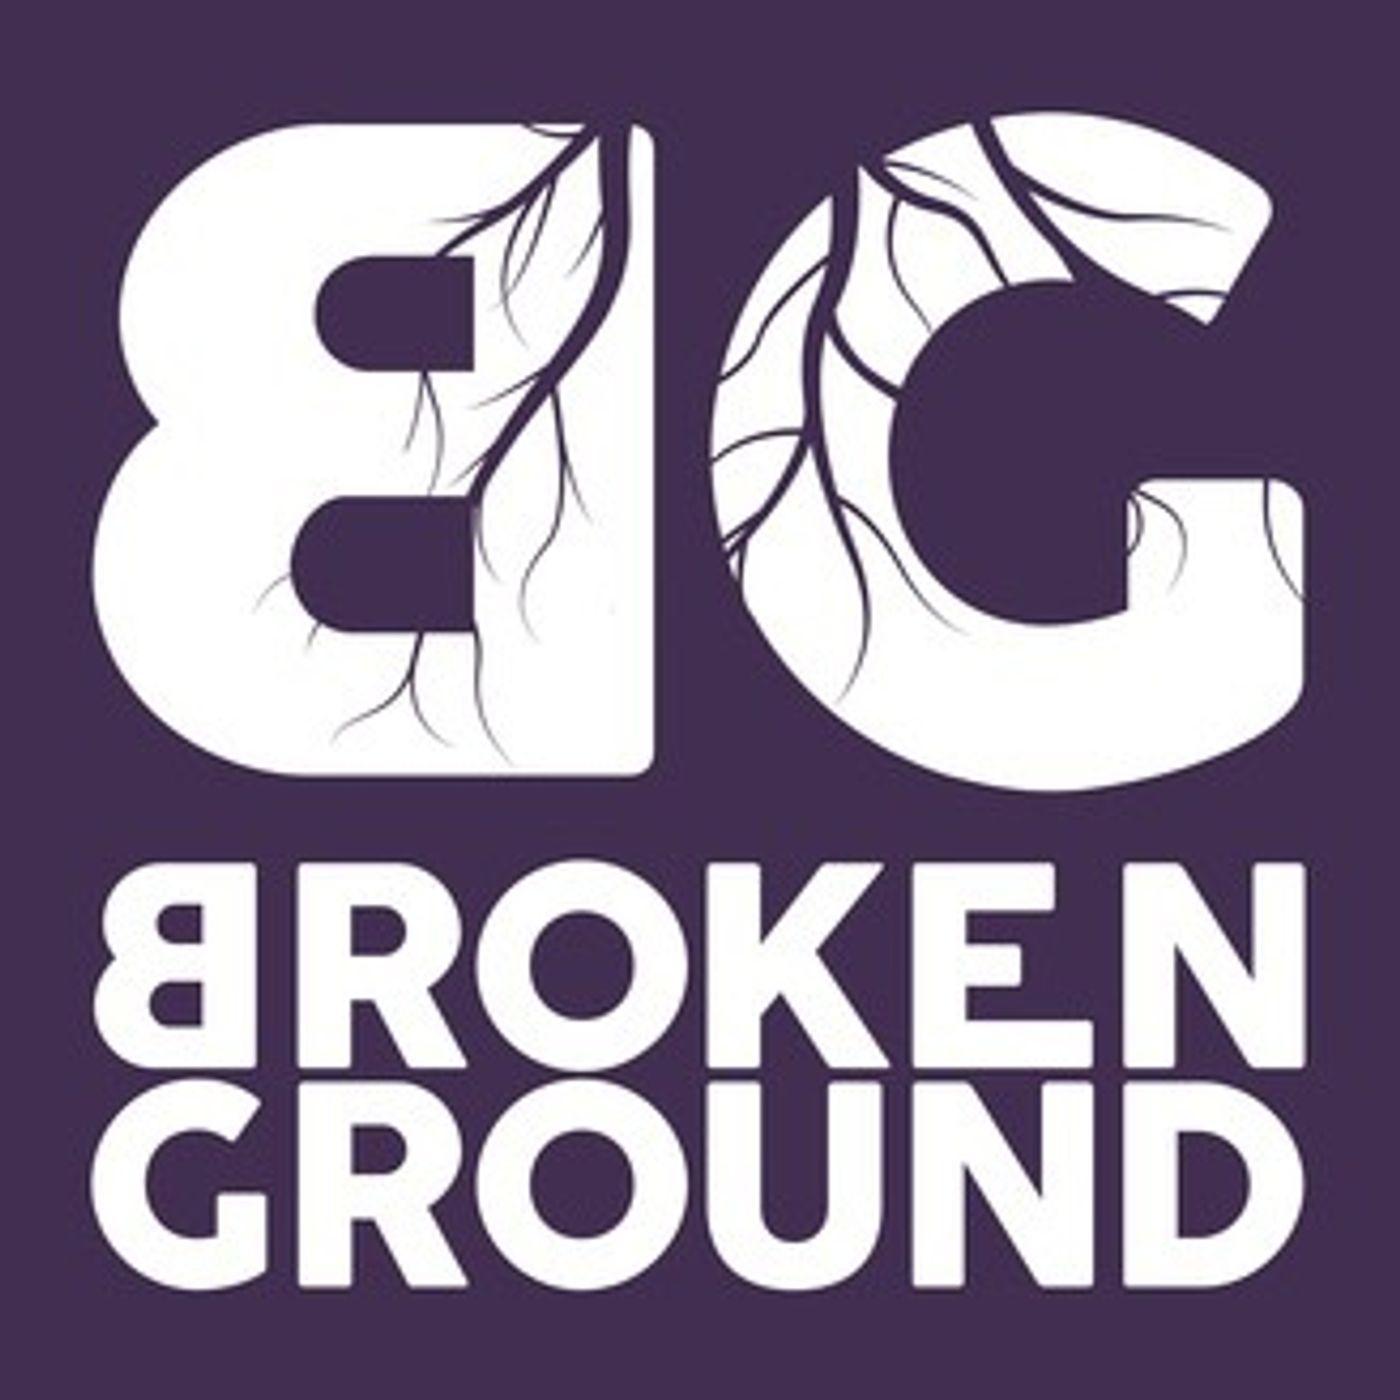 Broken Ground: Robert Bullard on environmental justice